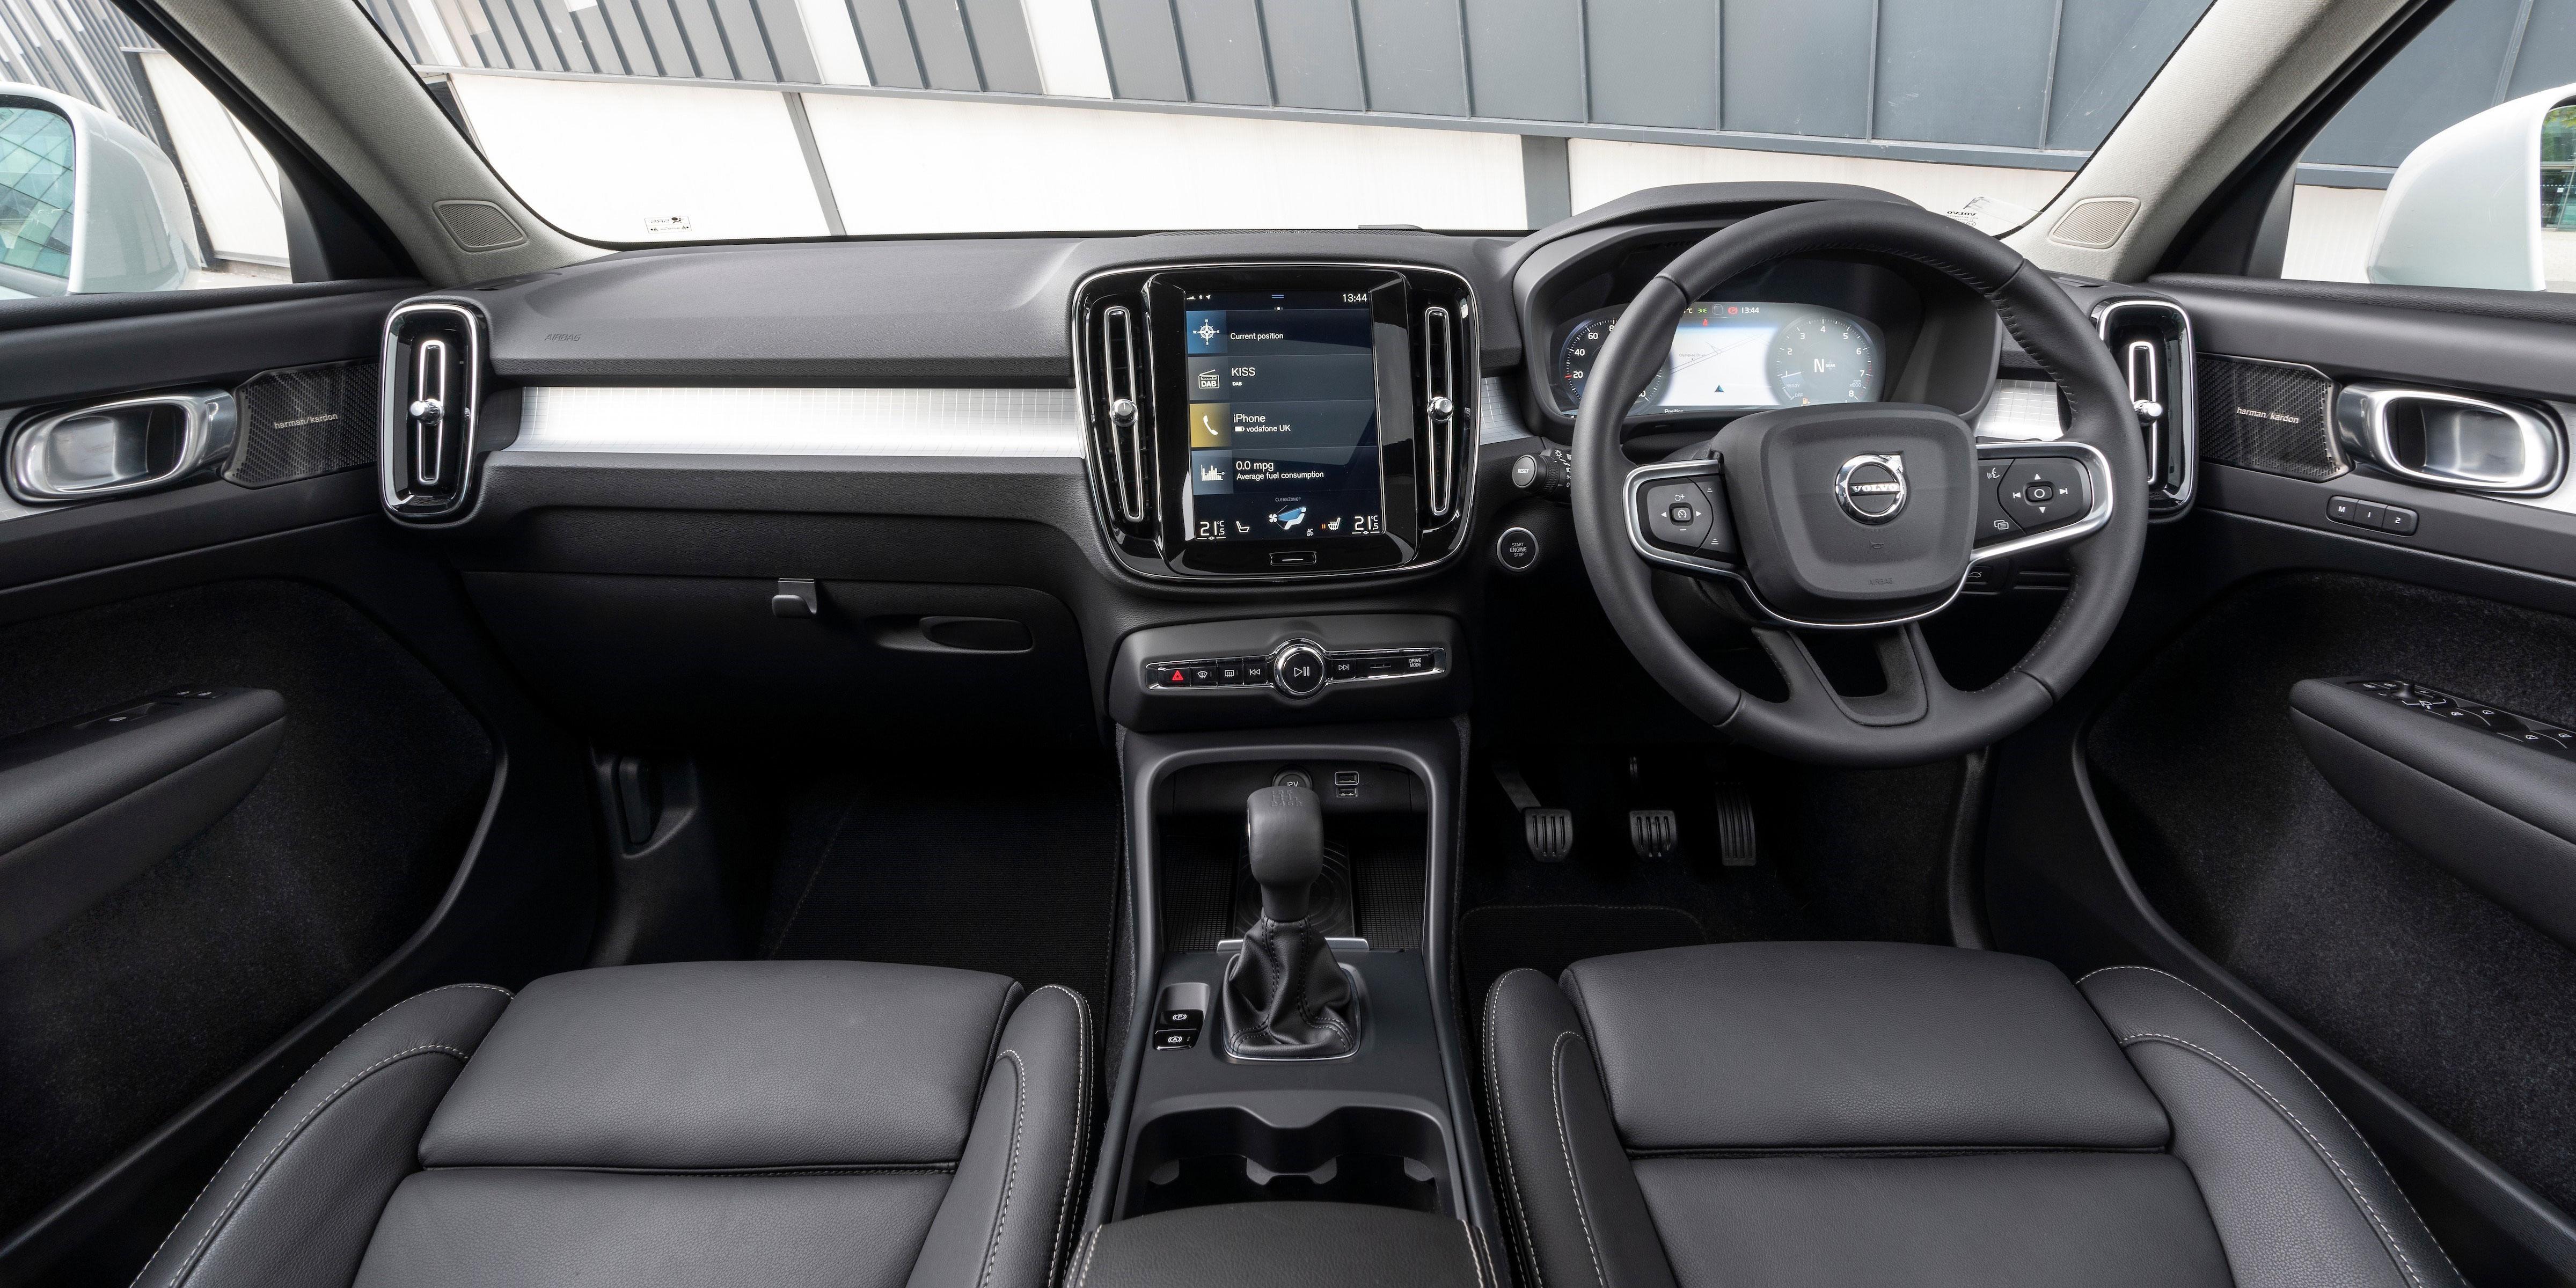 Toyota Uk Used Cars >> Volvo XC40 Interior & Infotainment | carwow